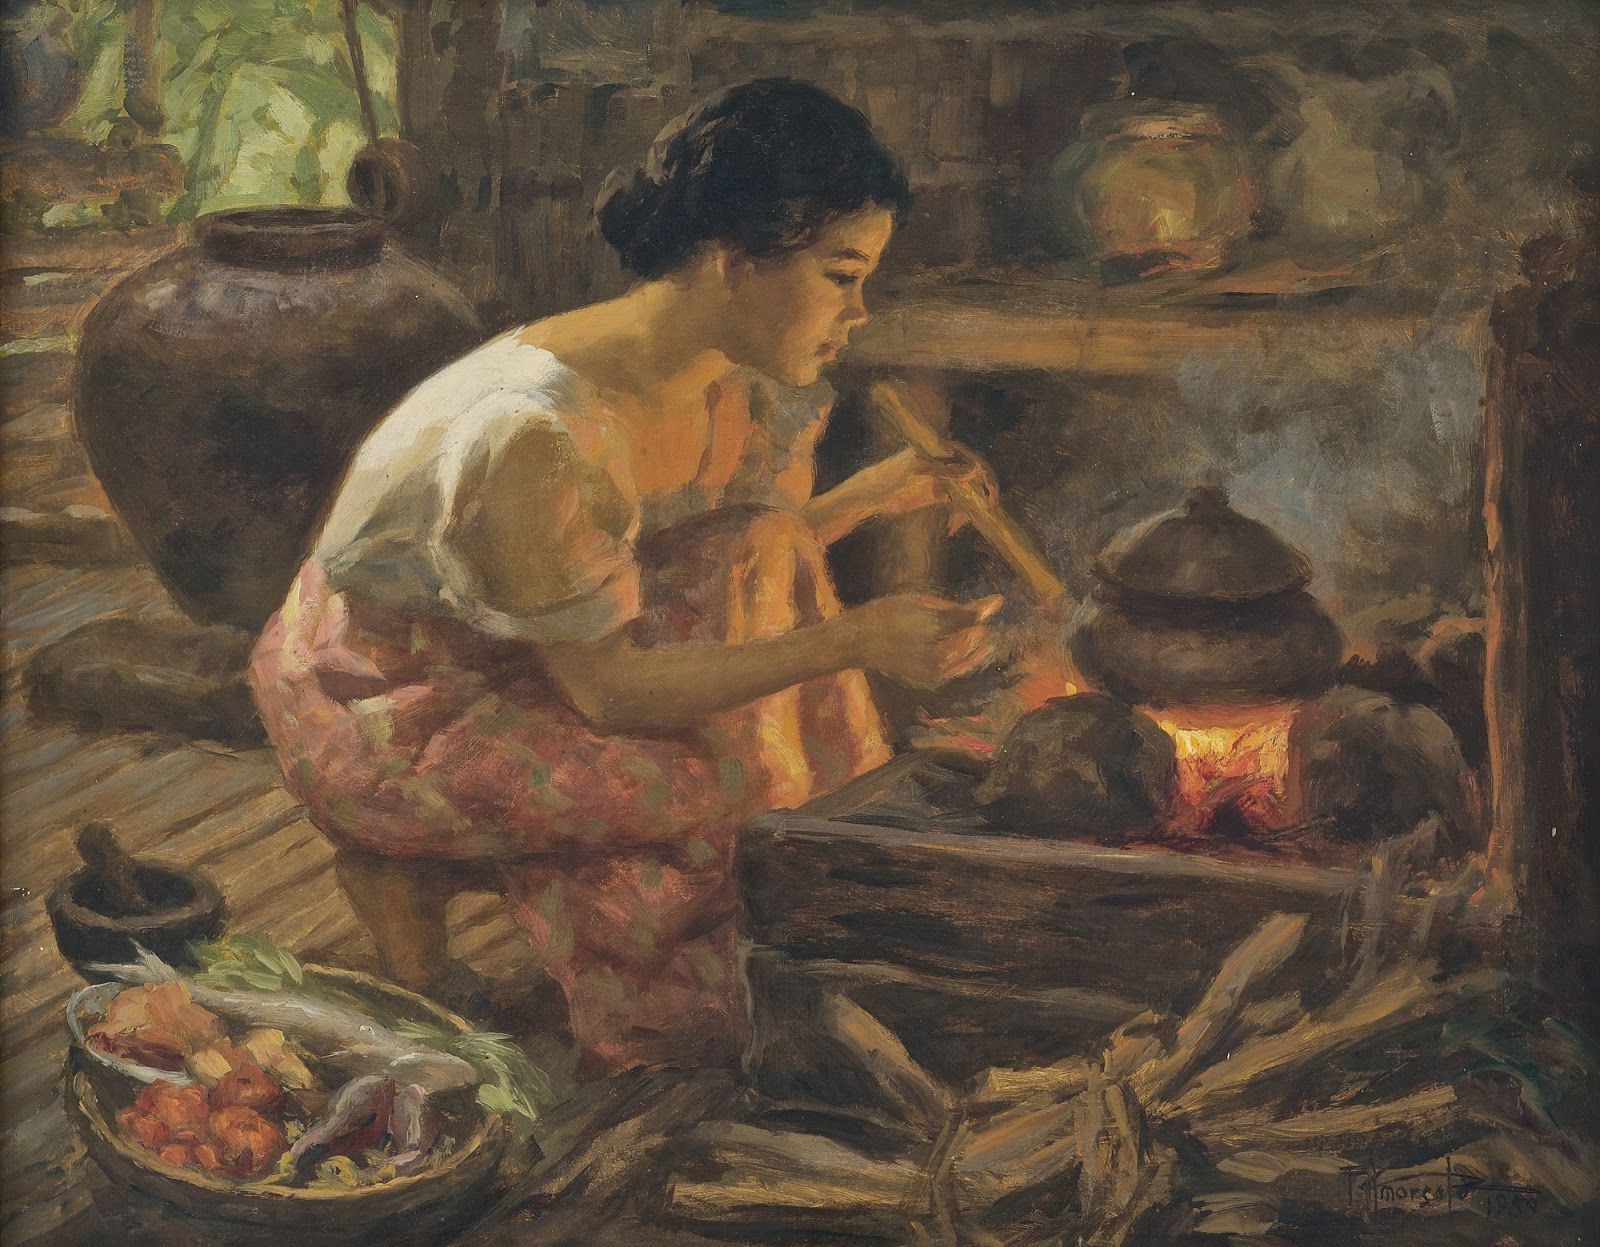 Fernando Amorsolo Genre and Historical painter